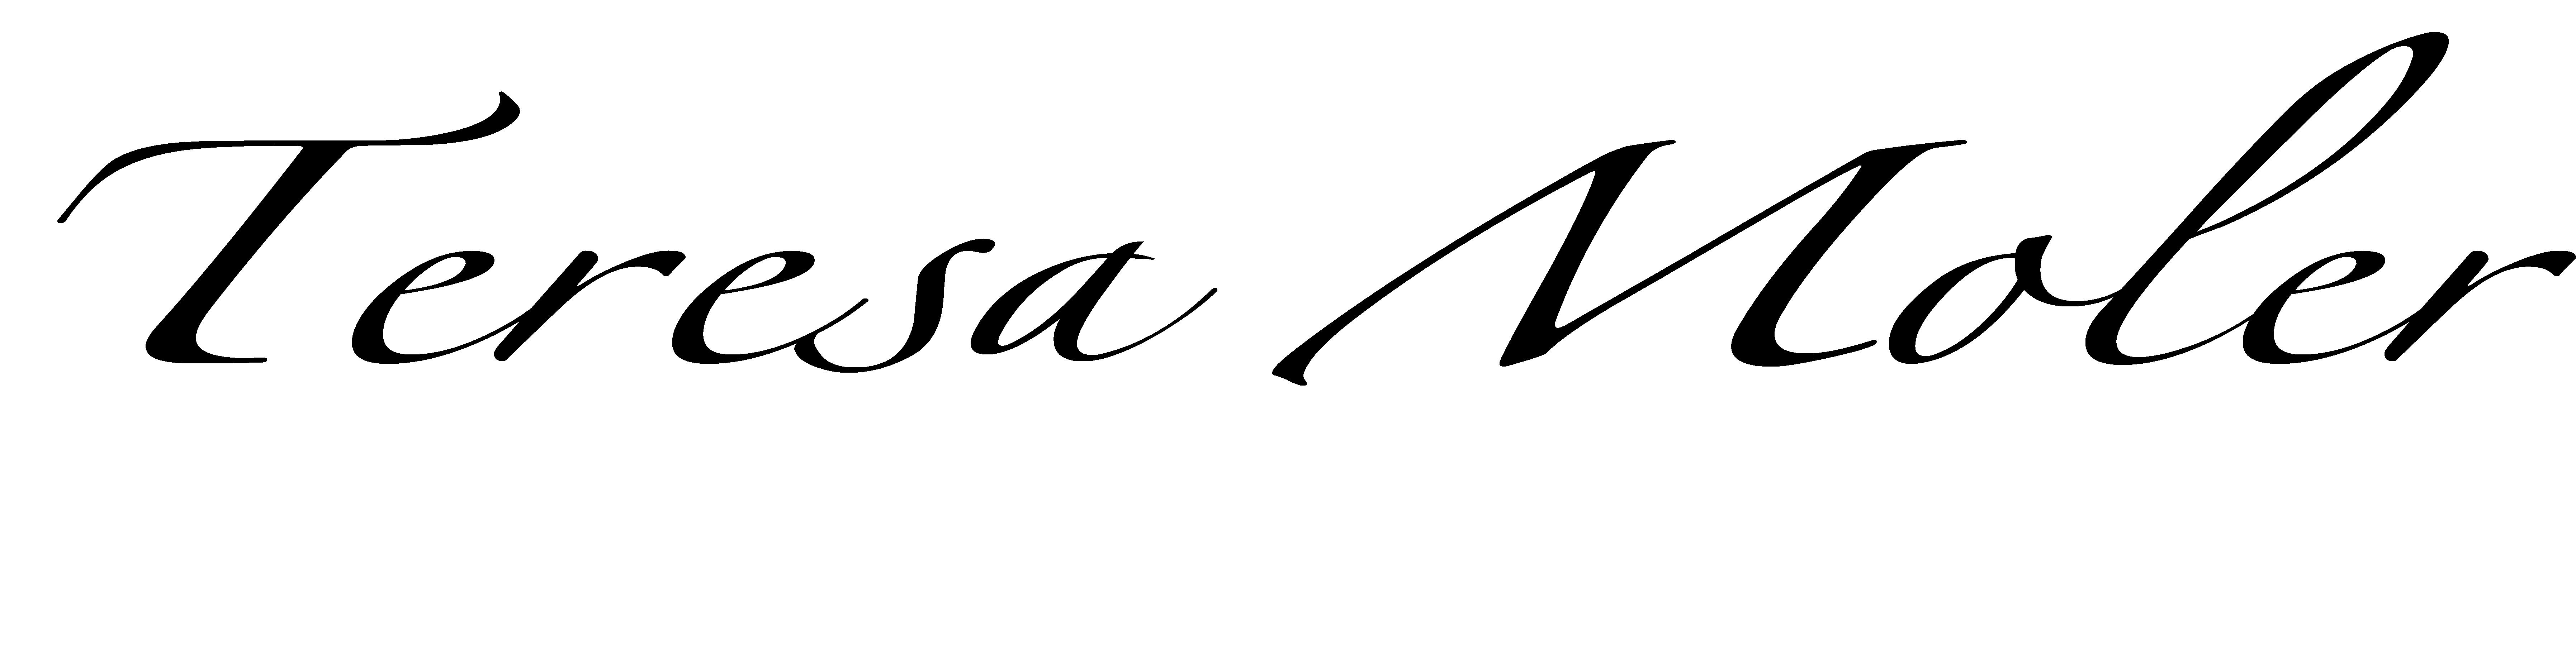 teresa Moler Signature